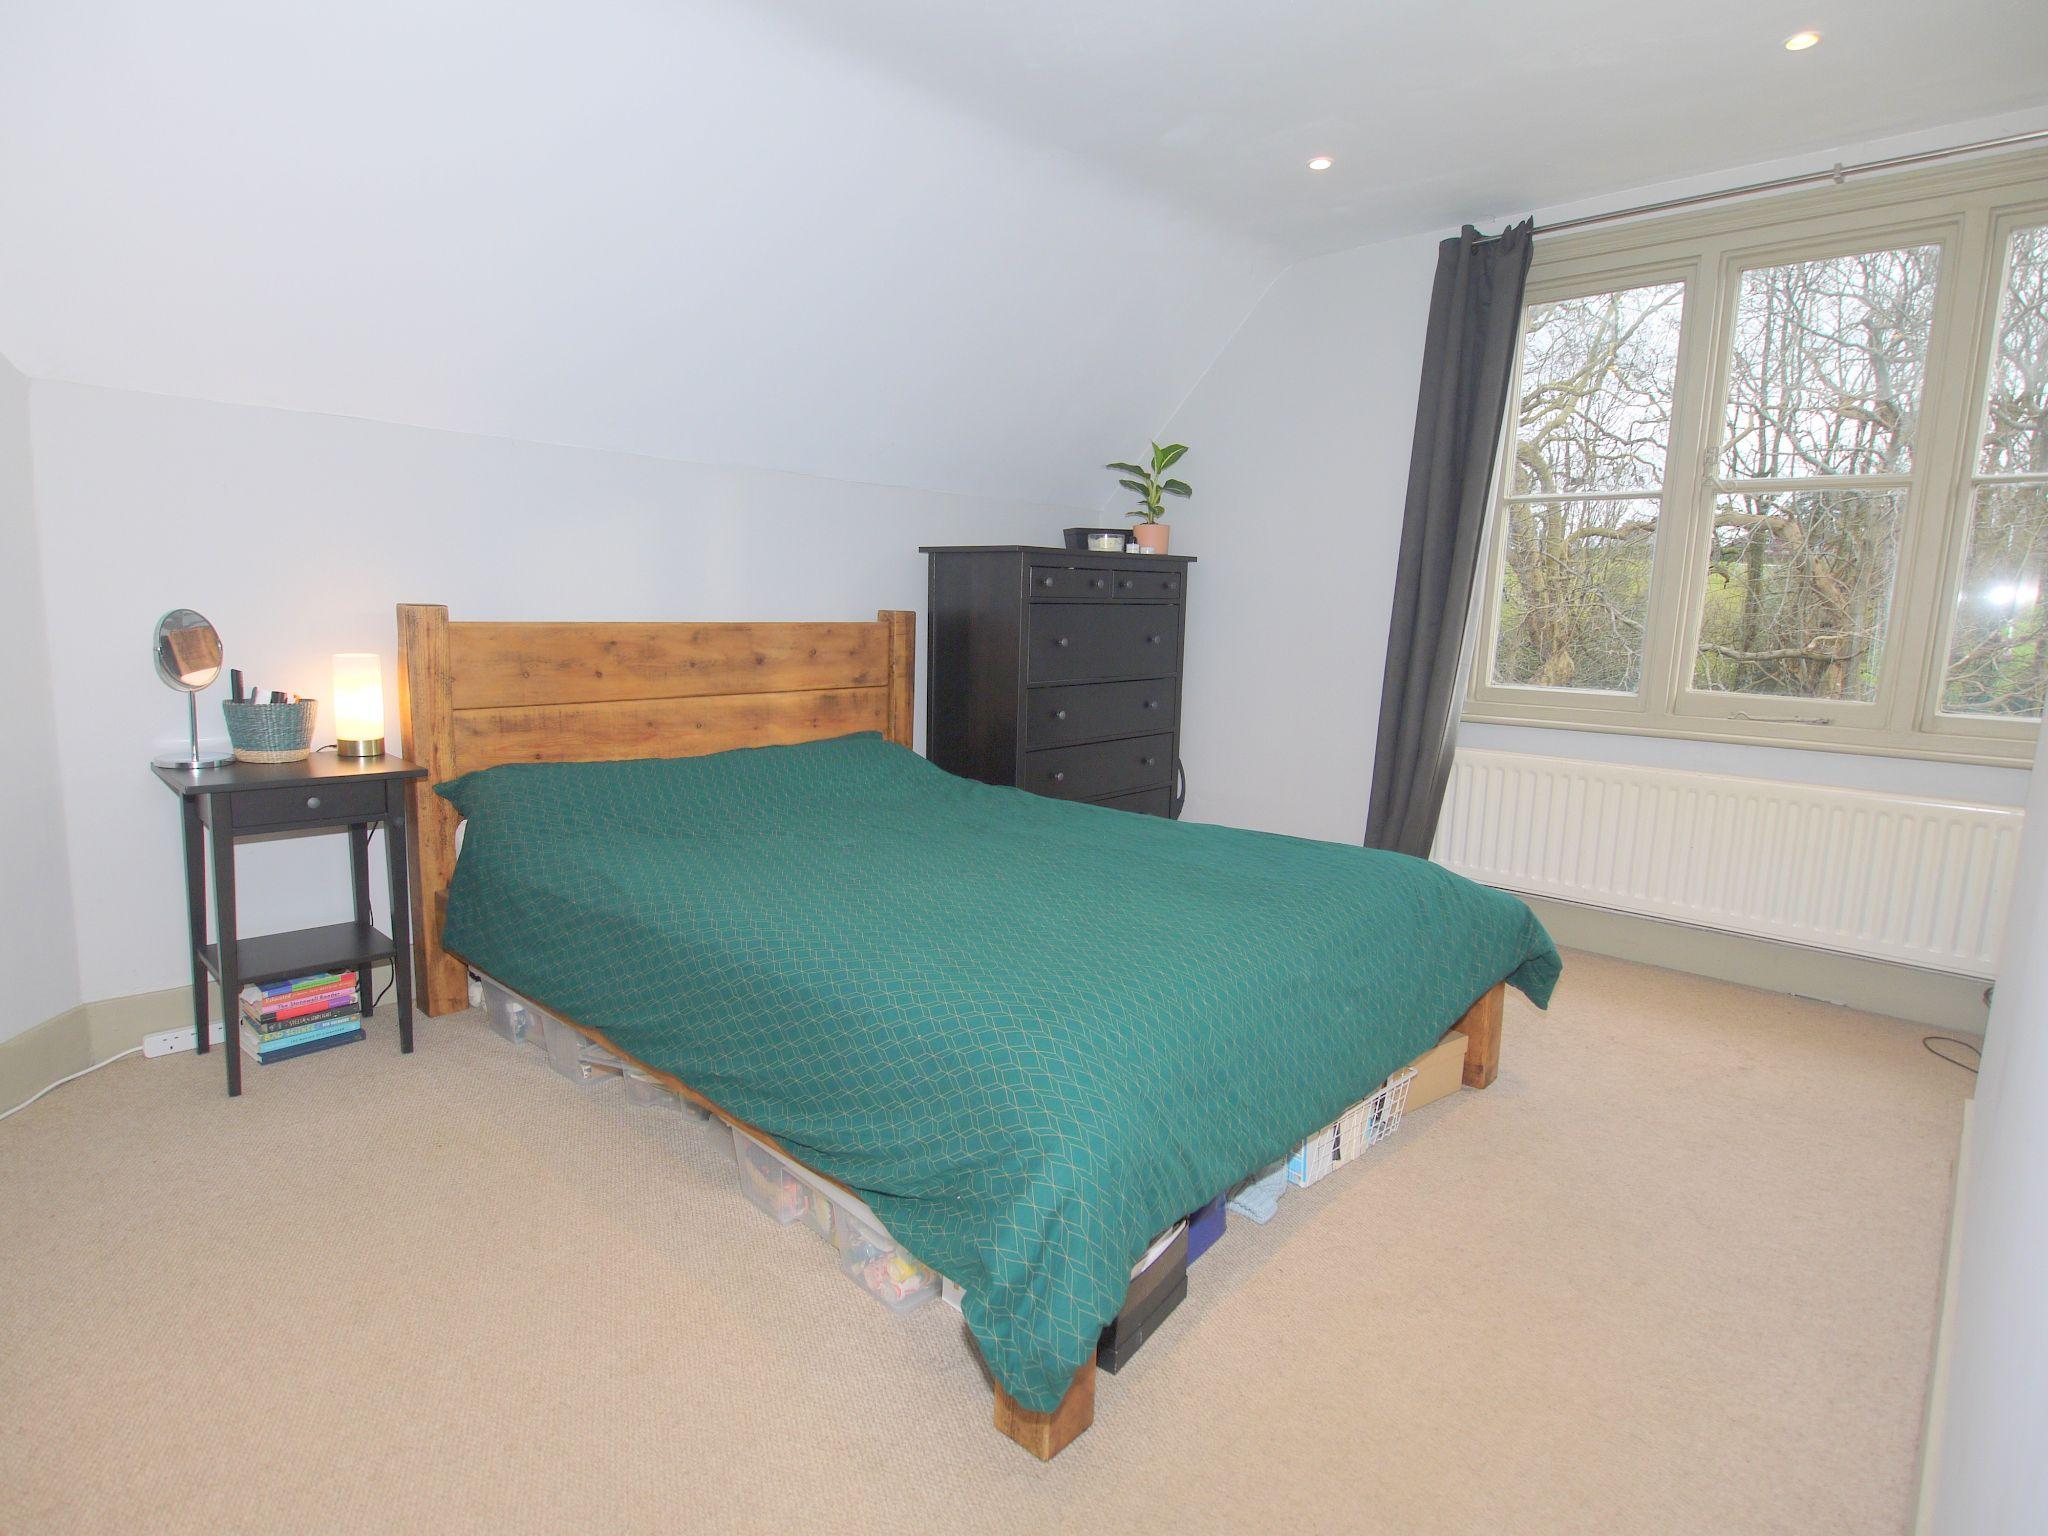 2 bedroom flat Sold in Sevenoaks - Photograph 5